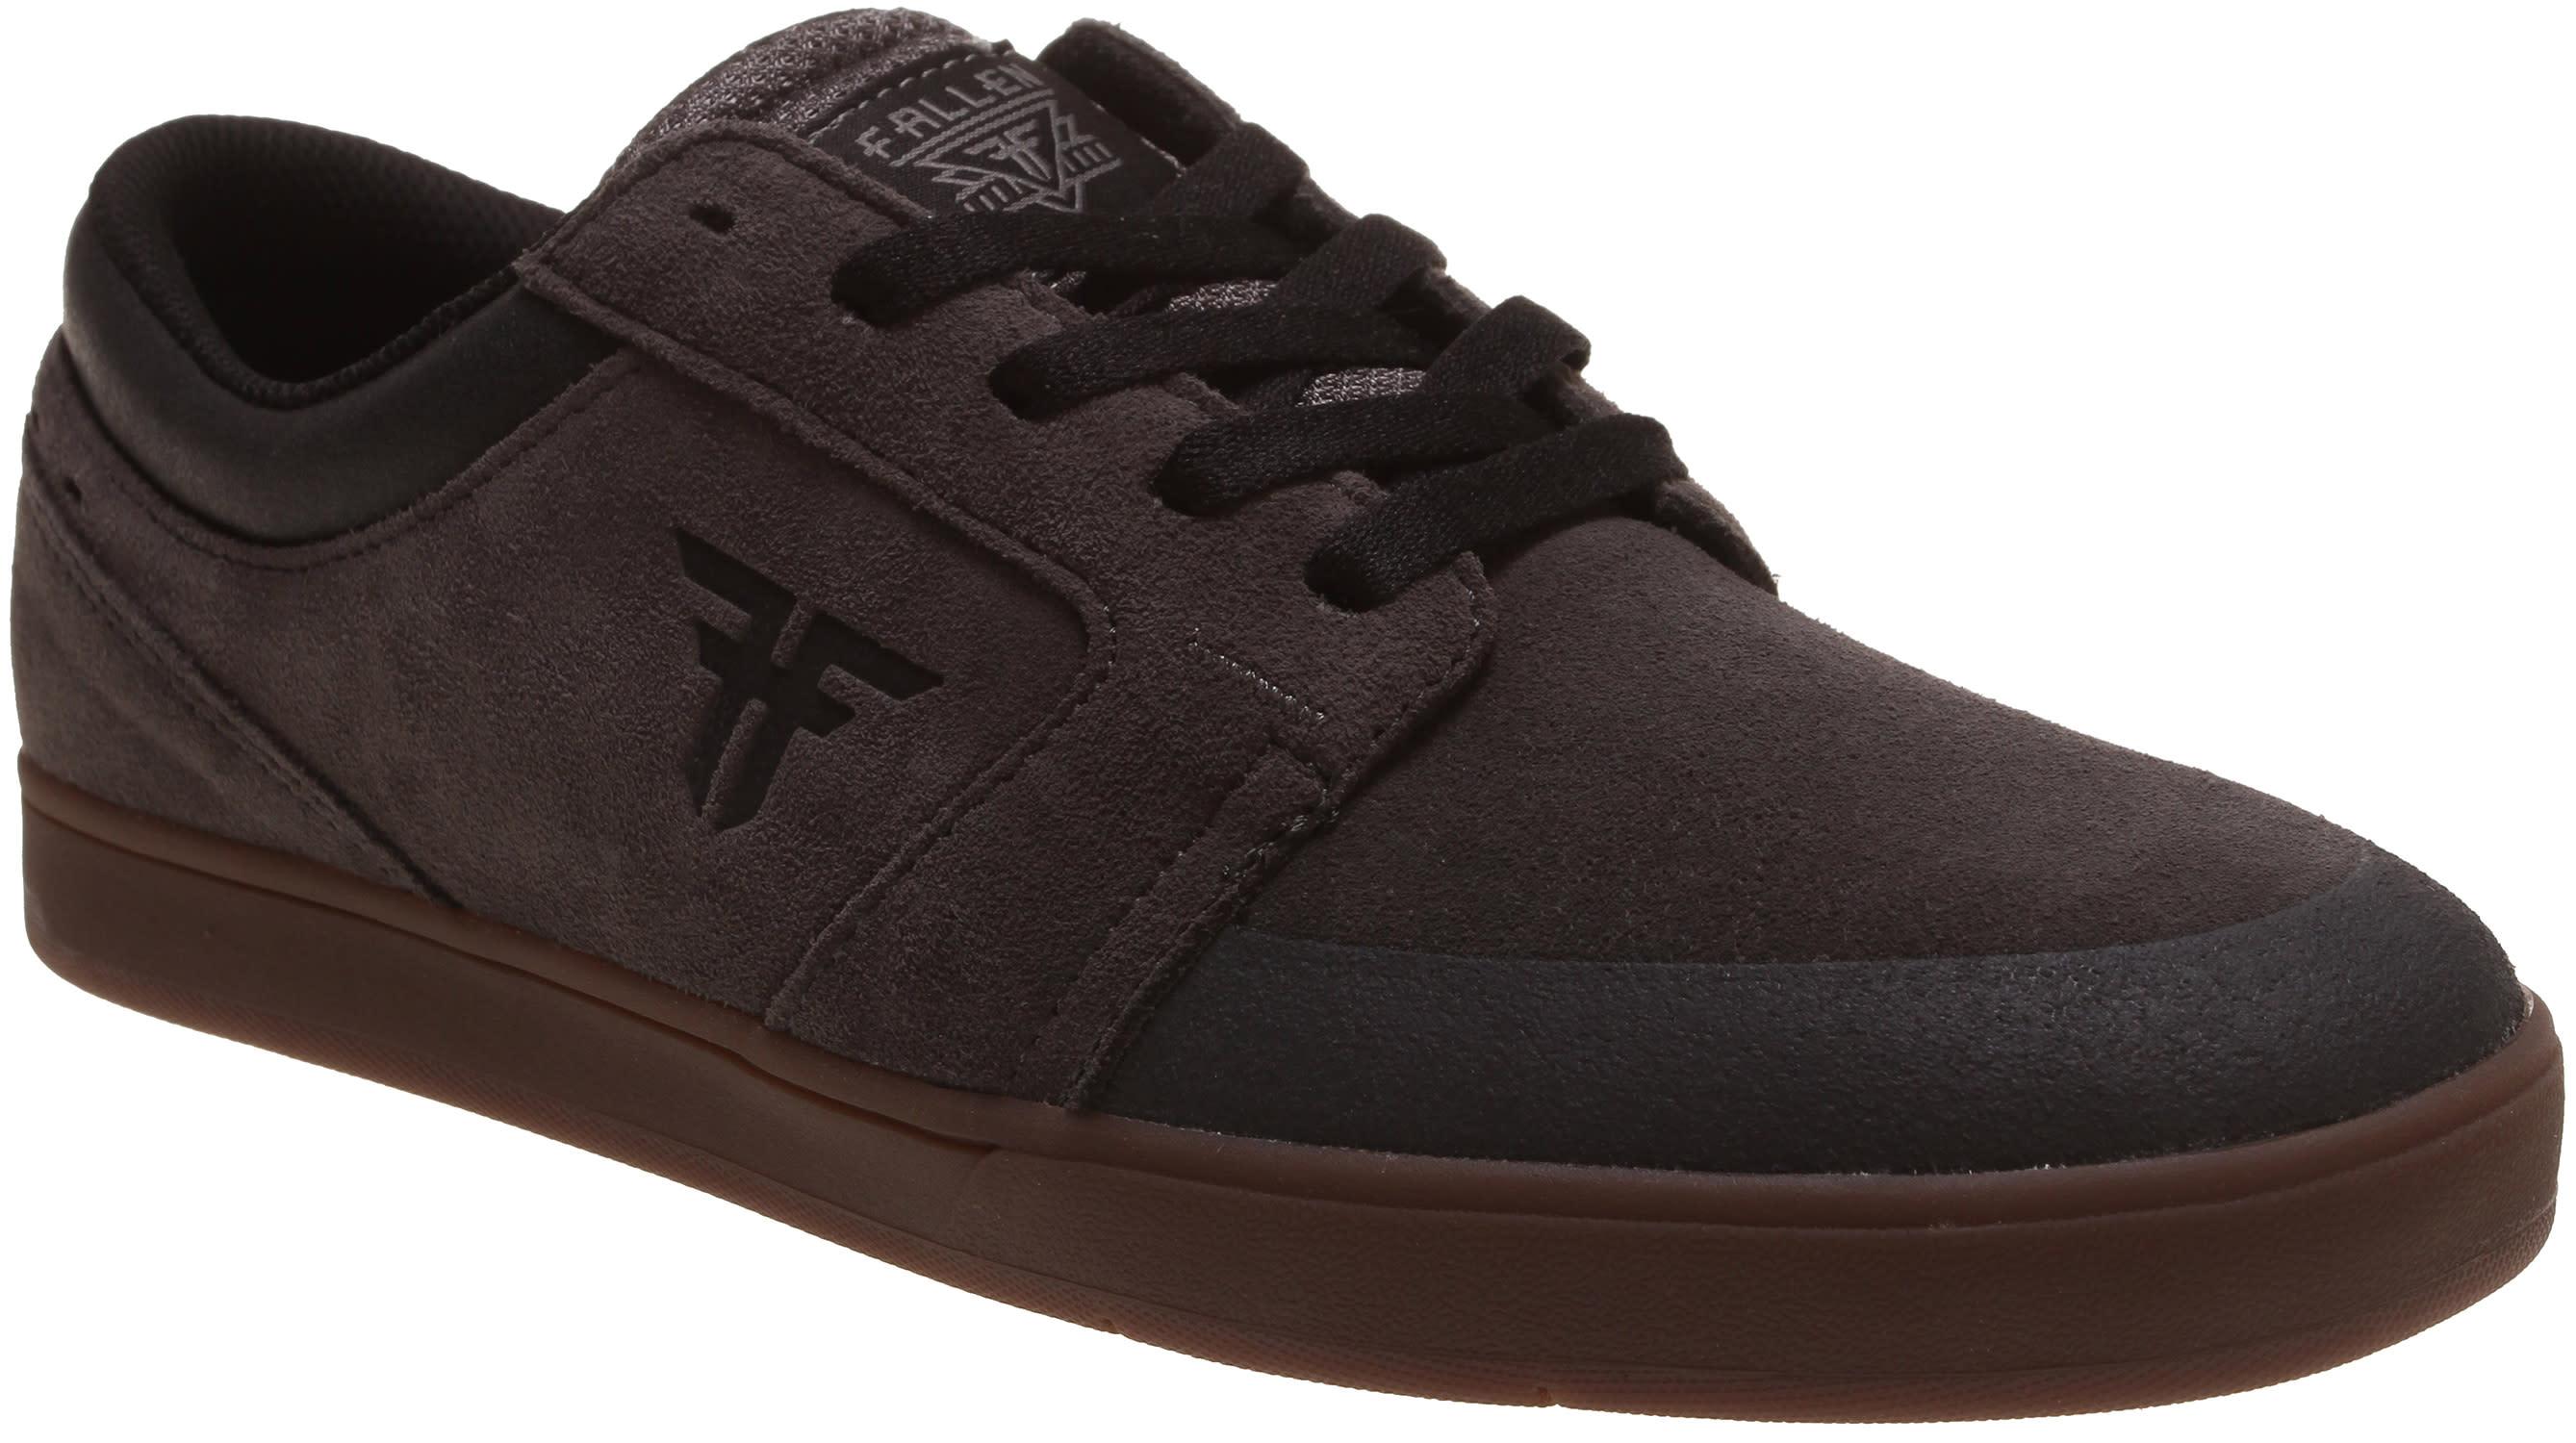 Torch Shoe Skate Shoe